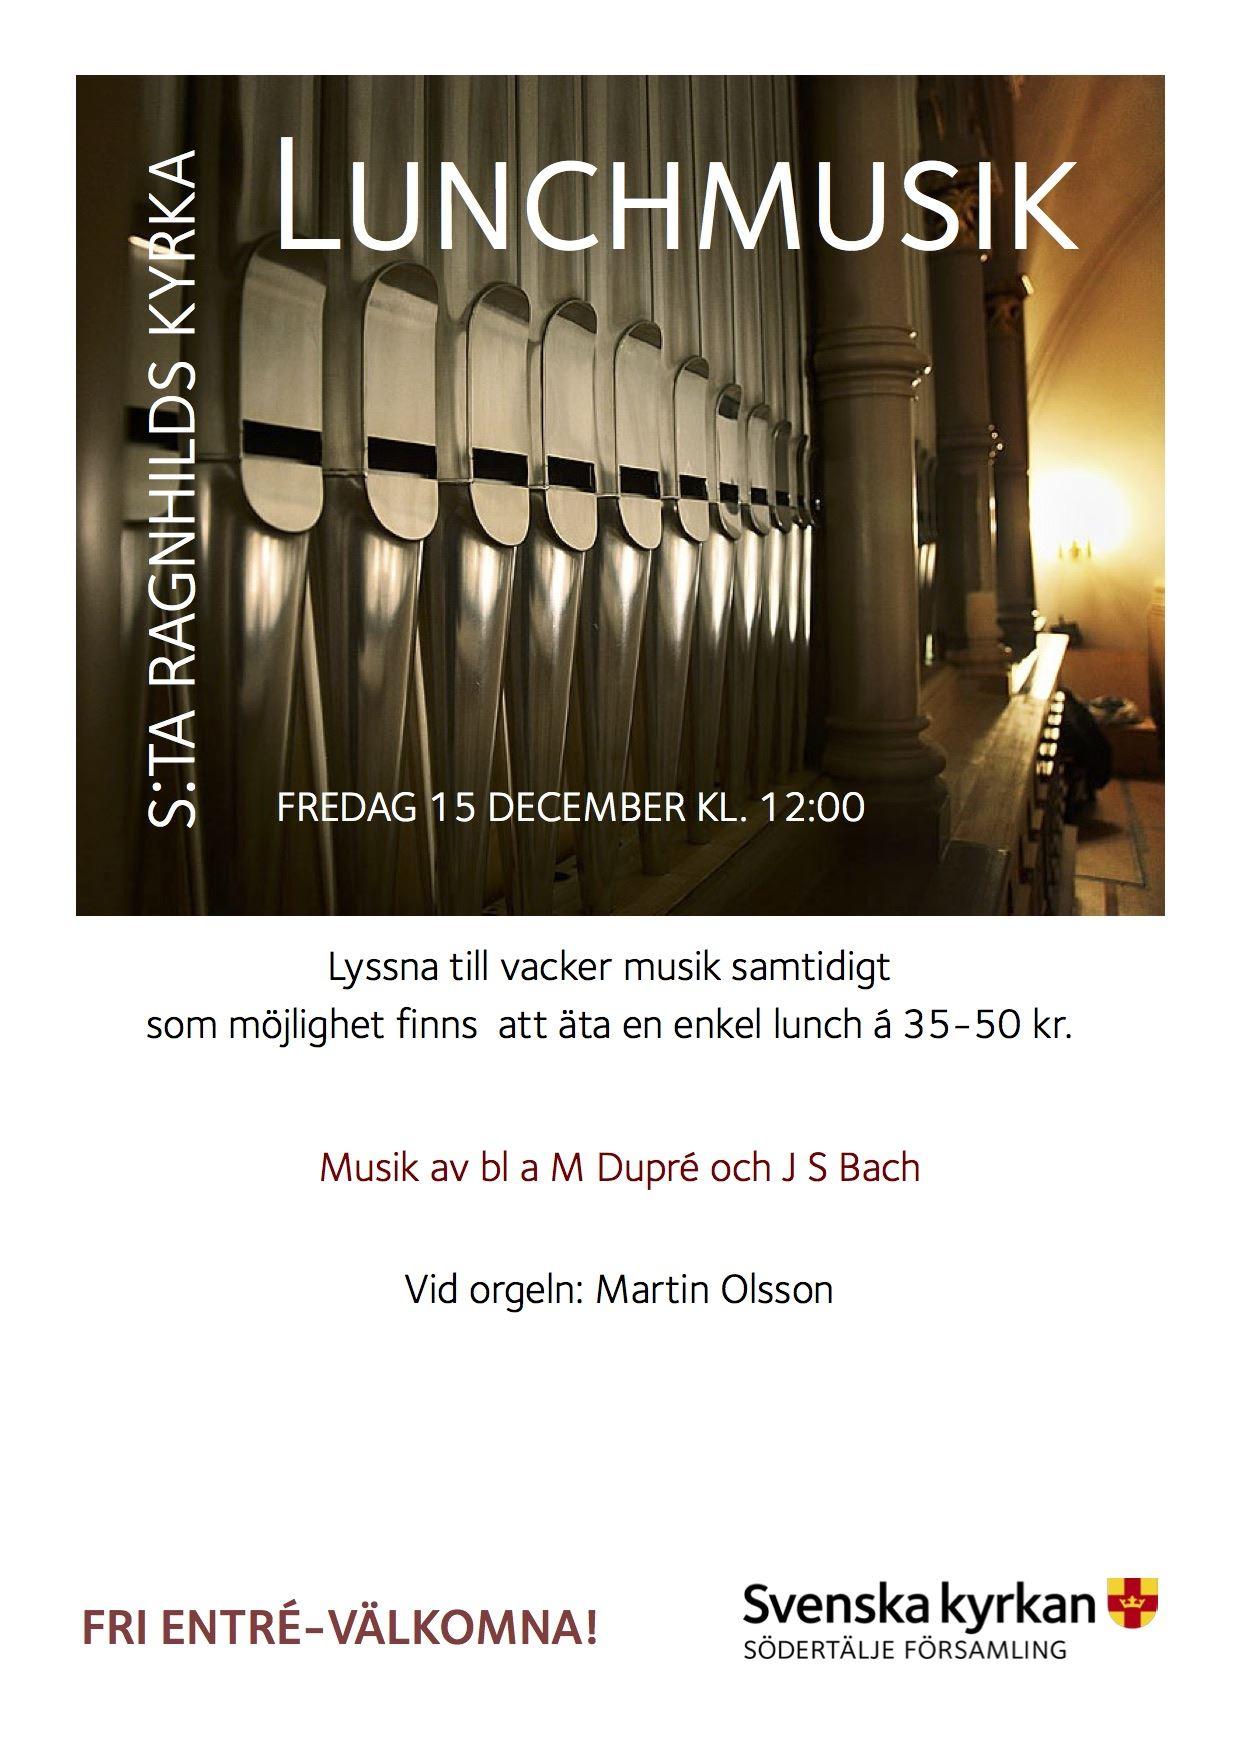 Lunchmusik i S:ta Ragnhilds kyrka